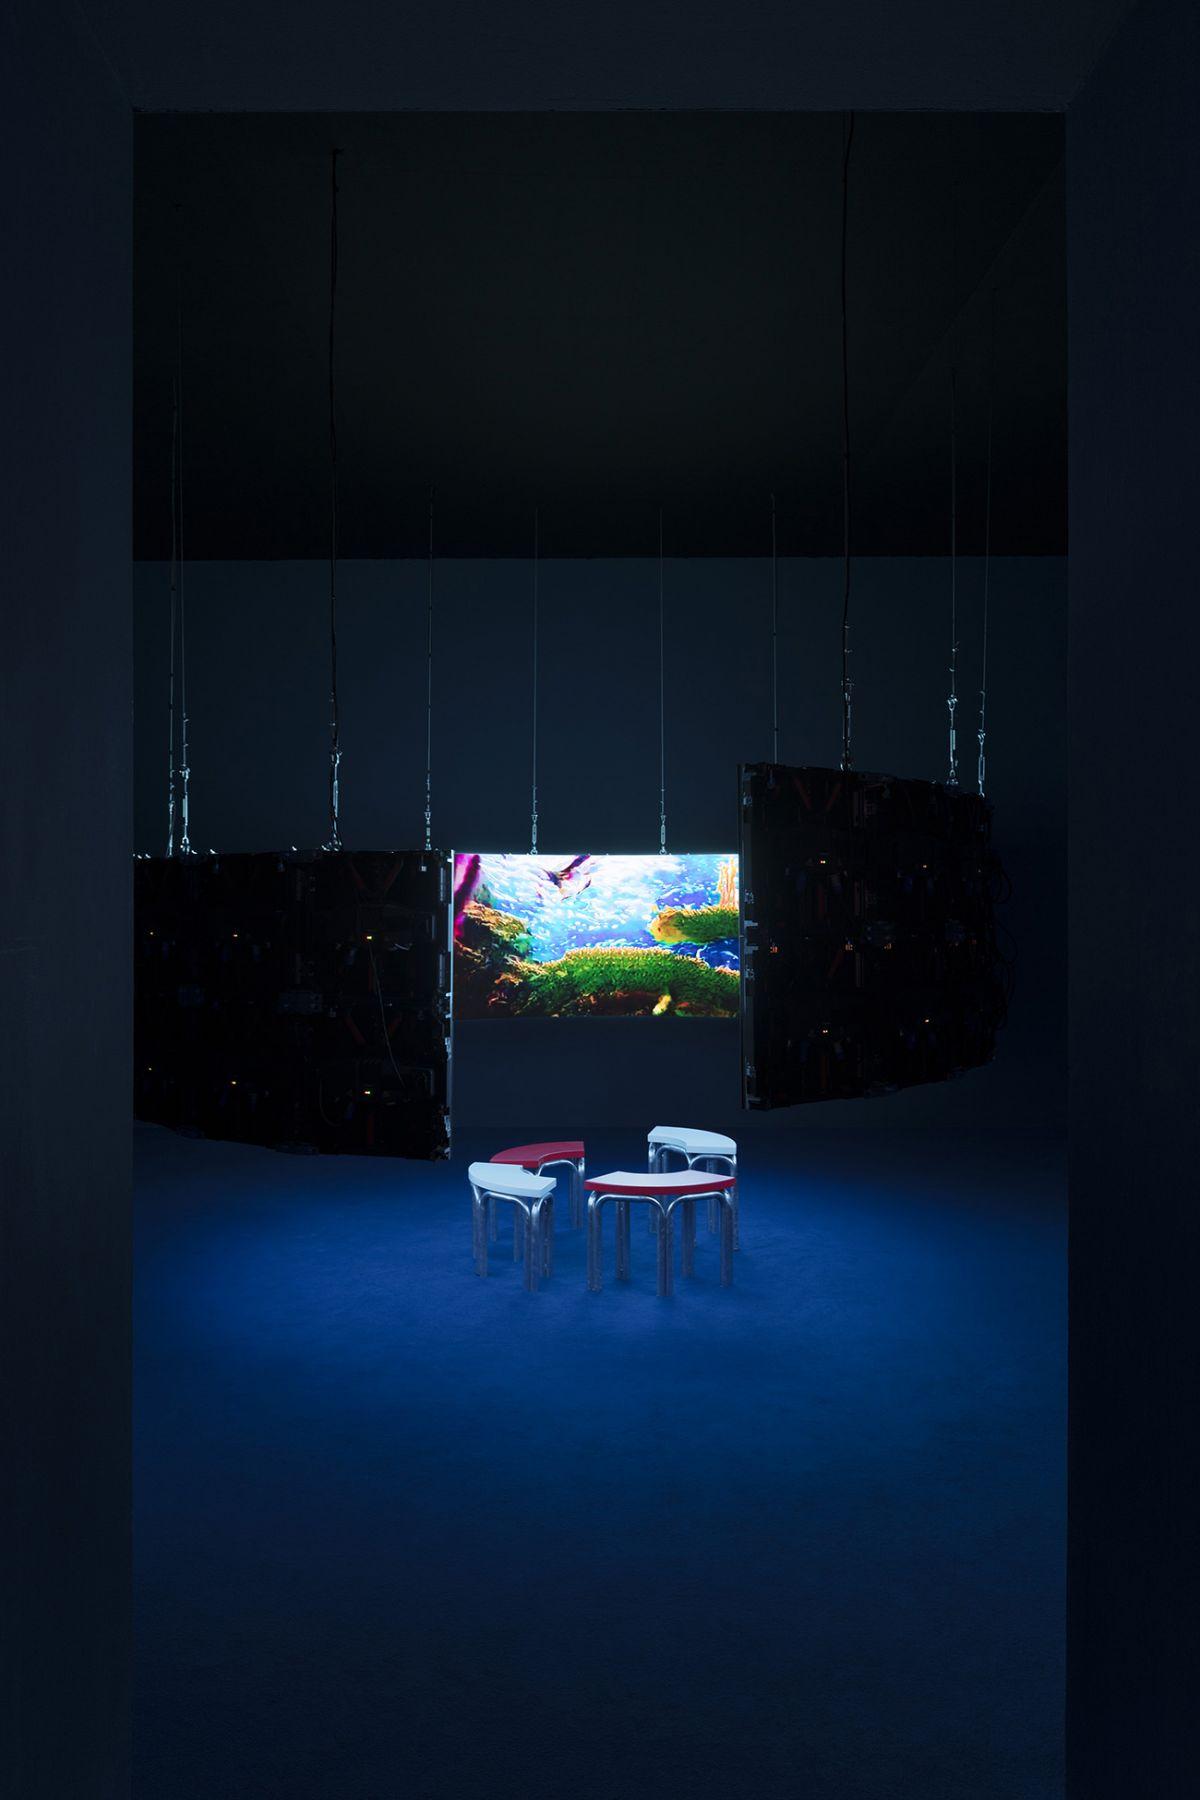 Hito Steyerl, Leonardo's Submarine, 2019